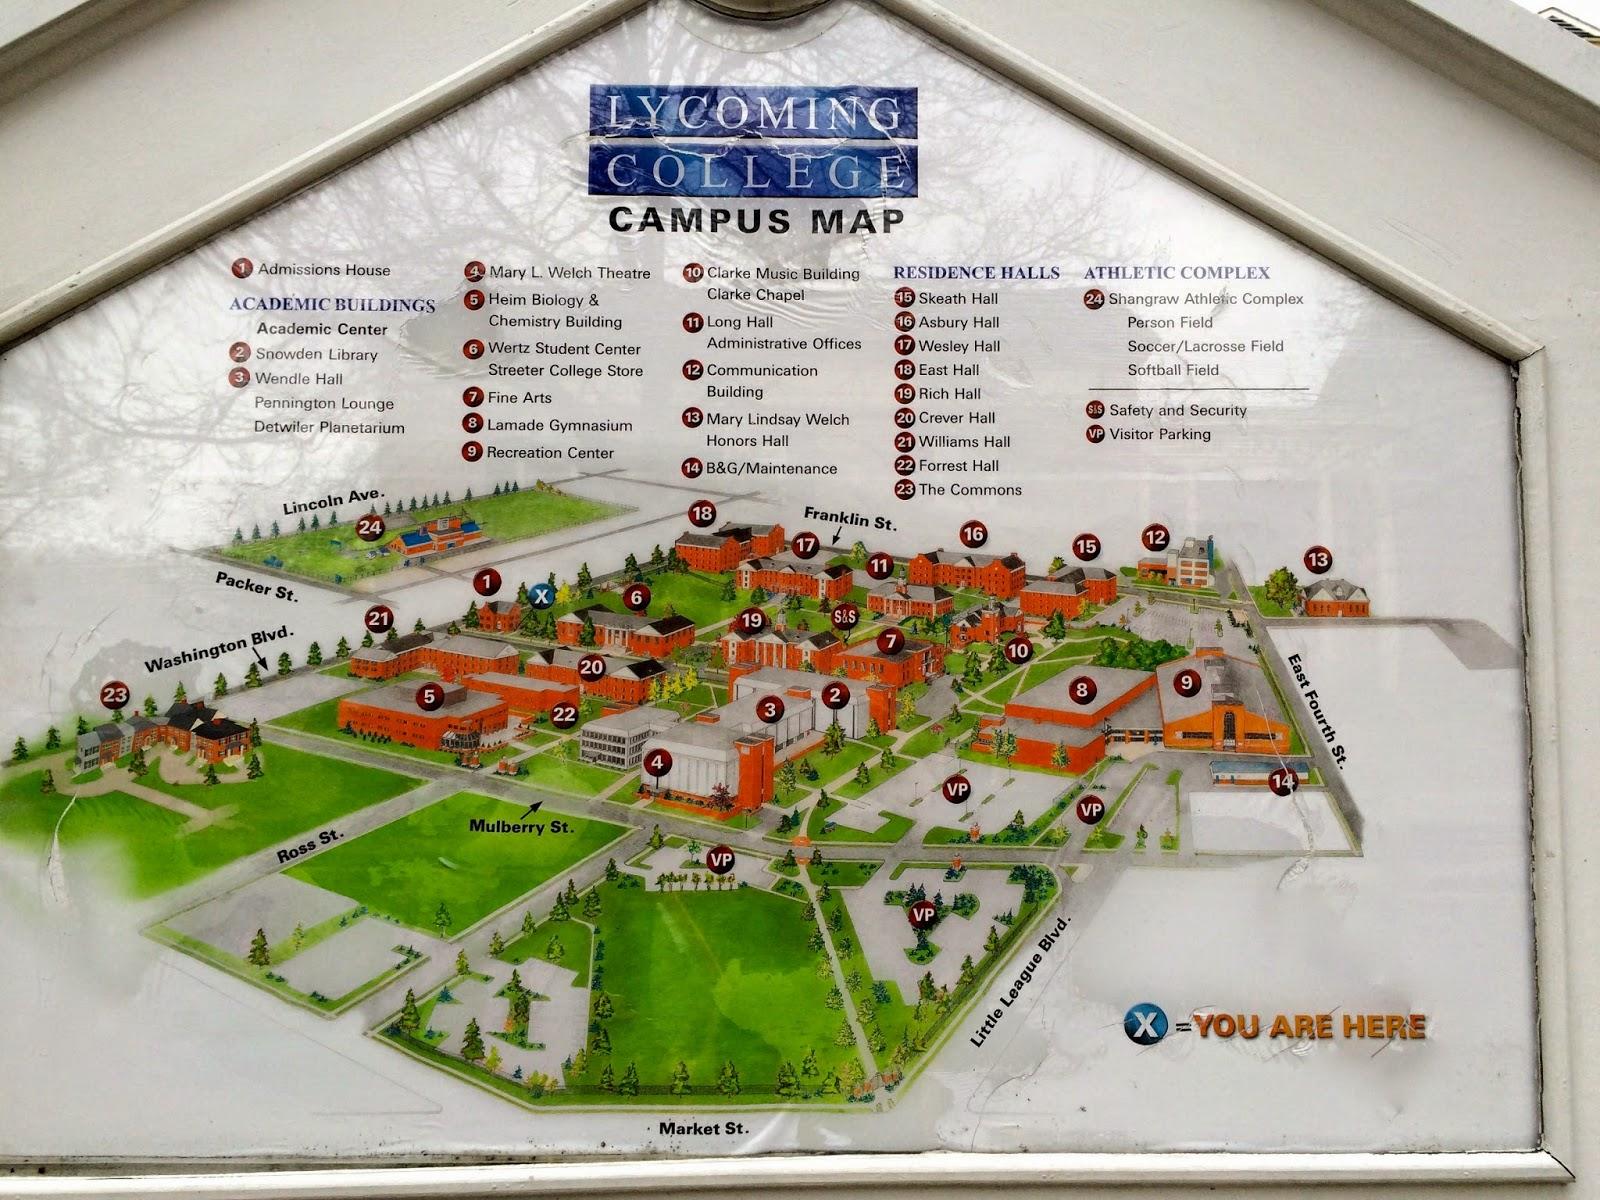 Suny Buffalo Campus Map.Ub Campus Map Map Of University Of Maryland Greece Ridge Mall Map